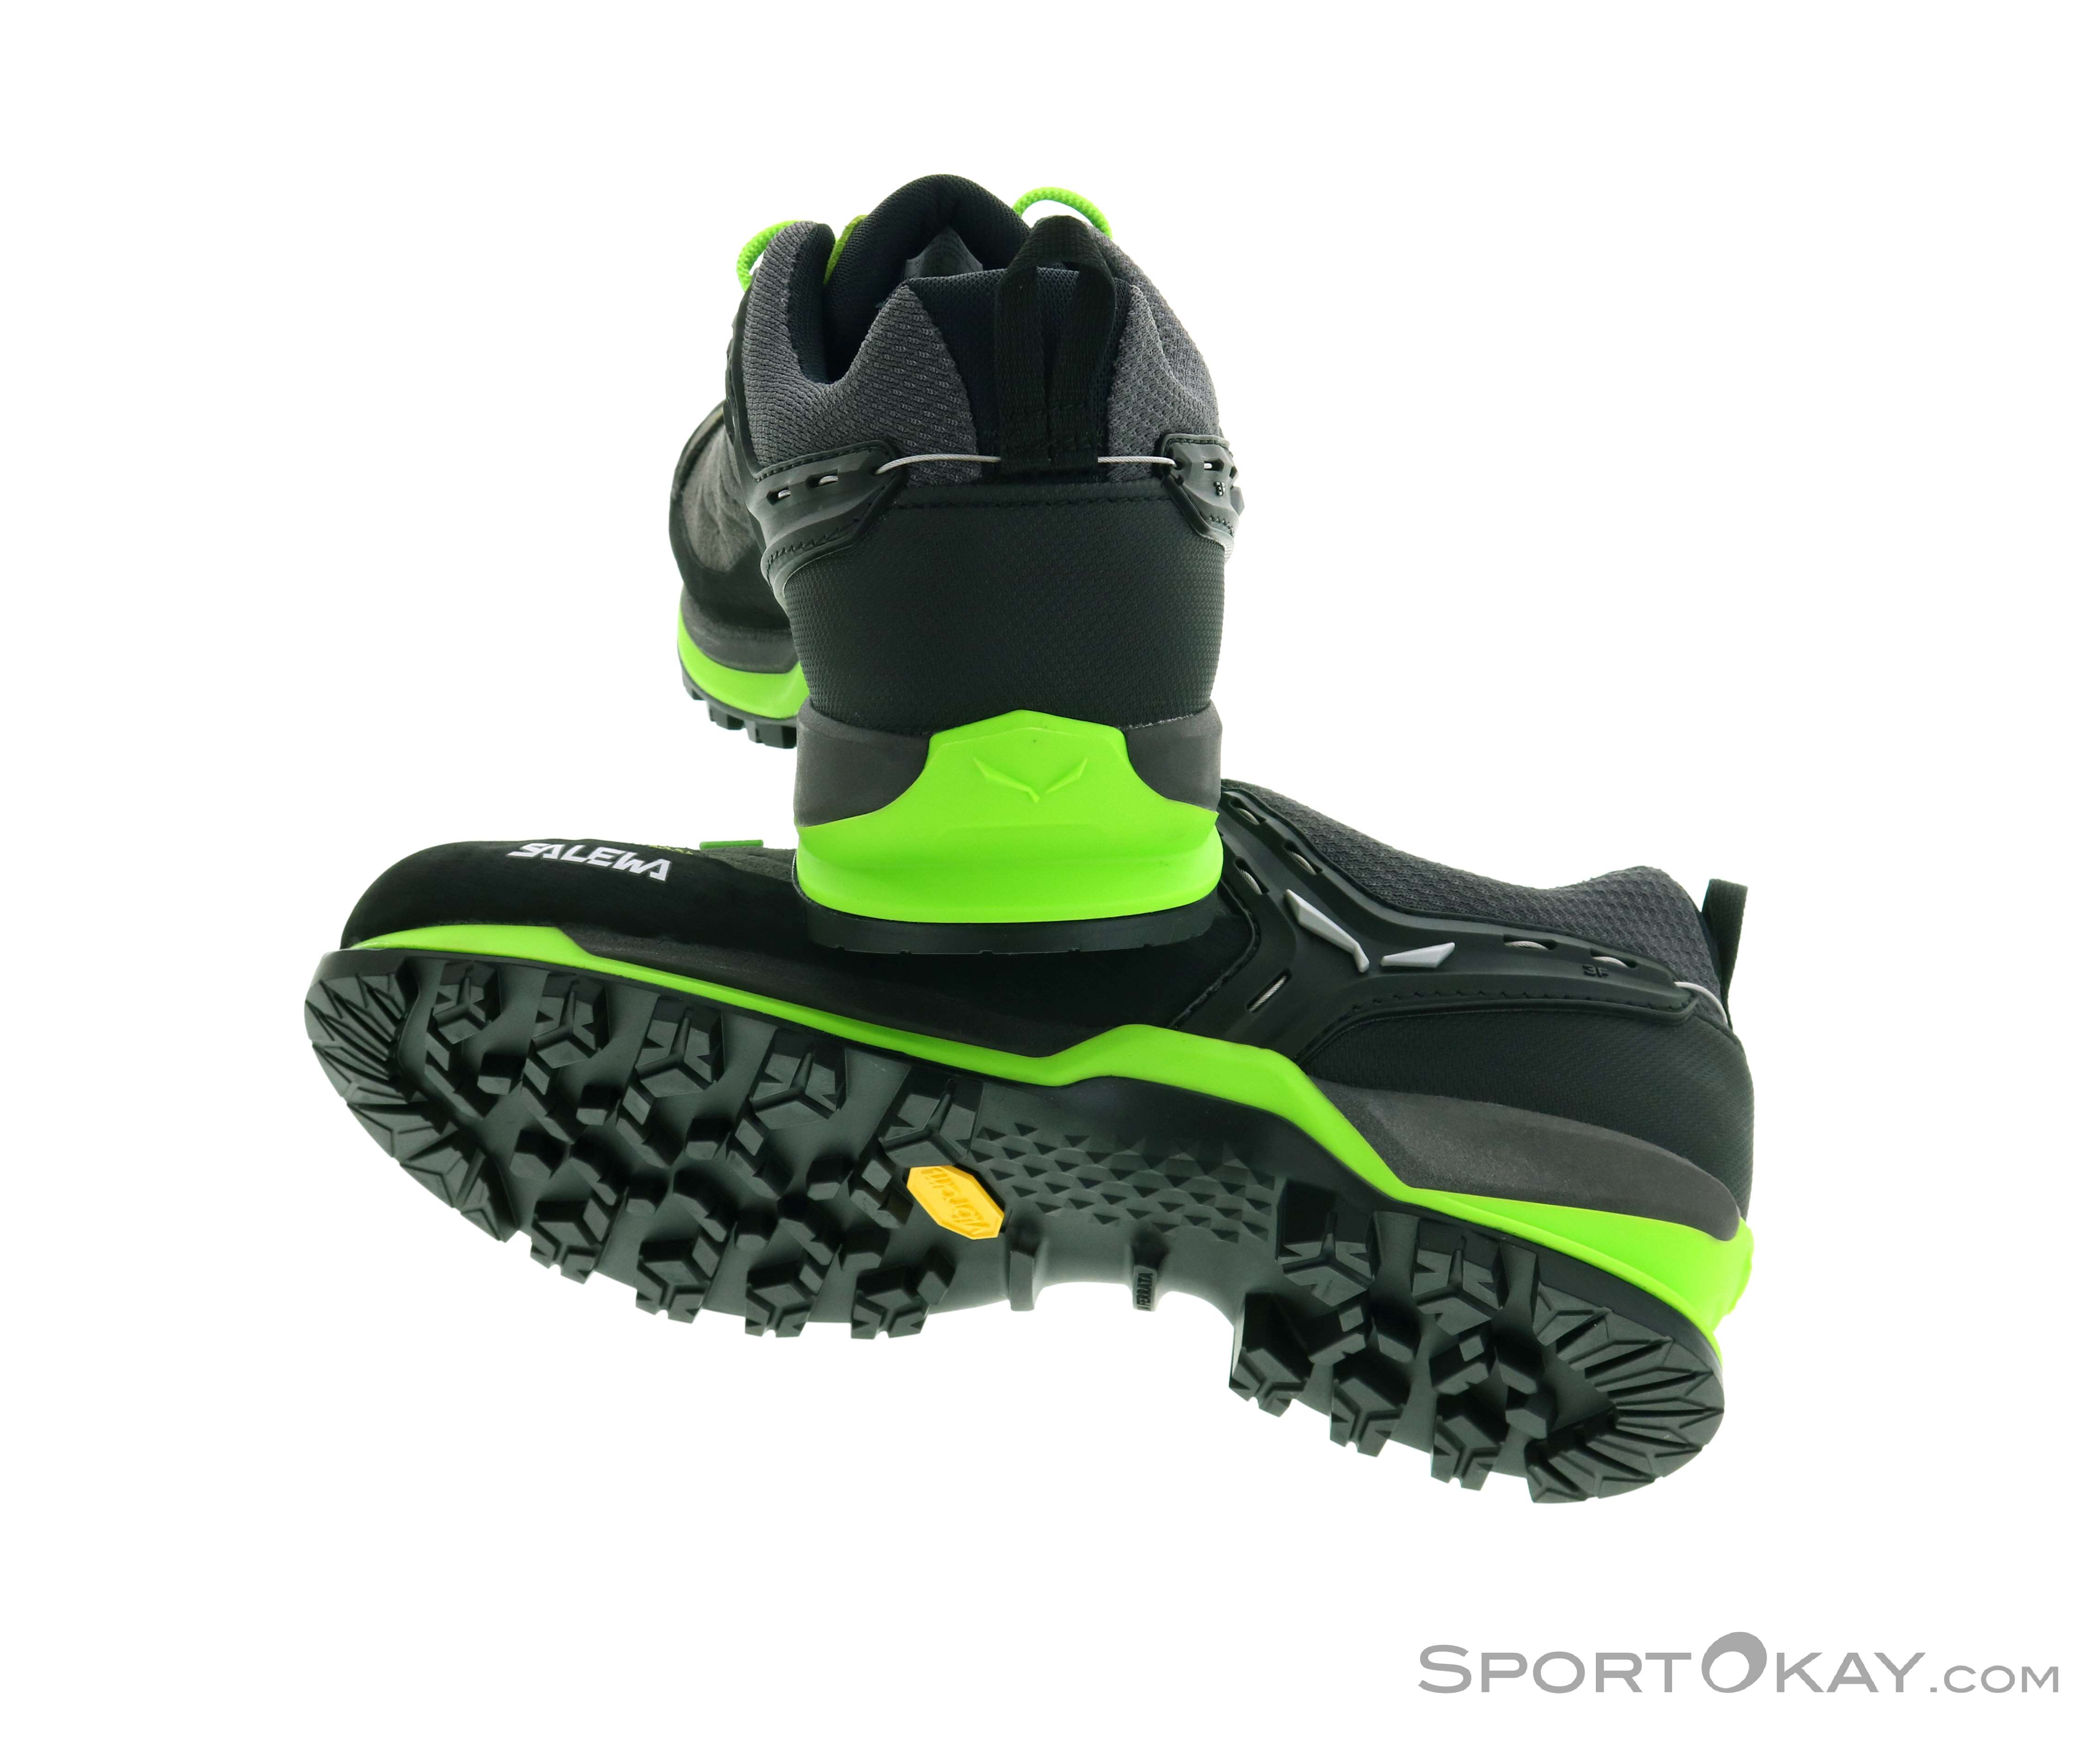 Scarpa Schuhe | Damen & Herren | Sport Schuster München